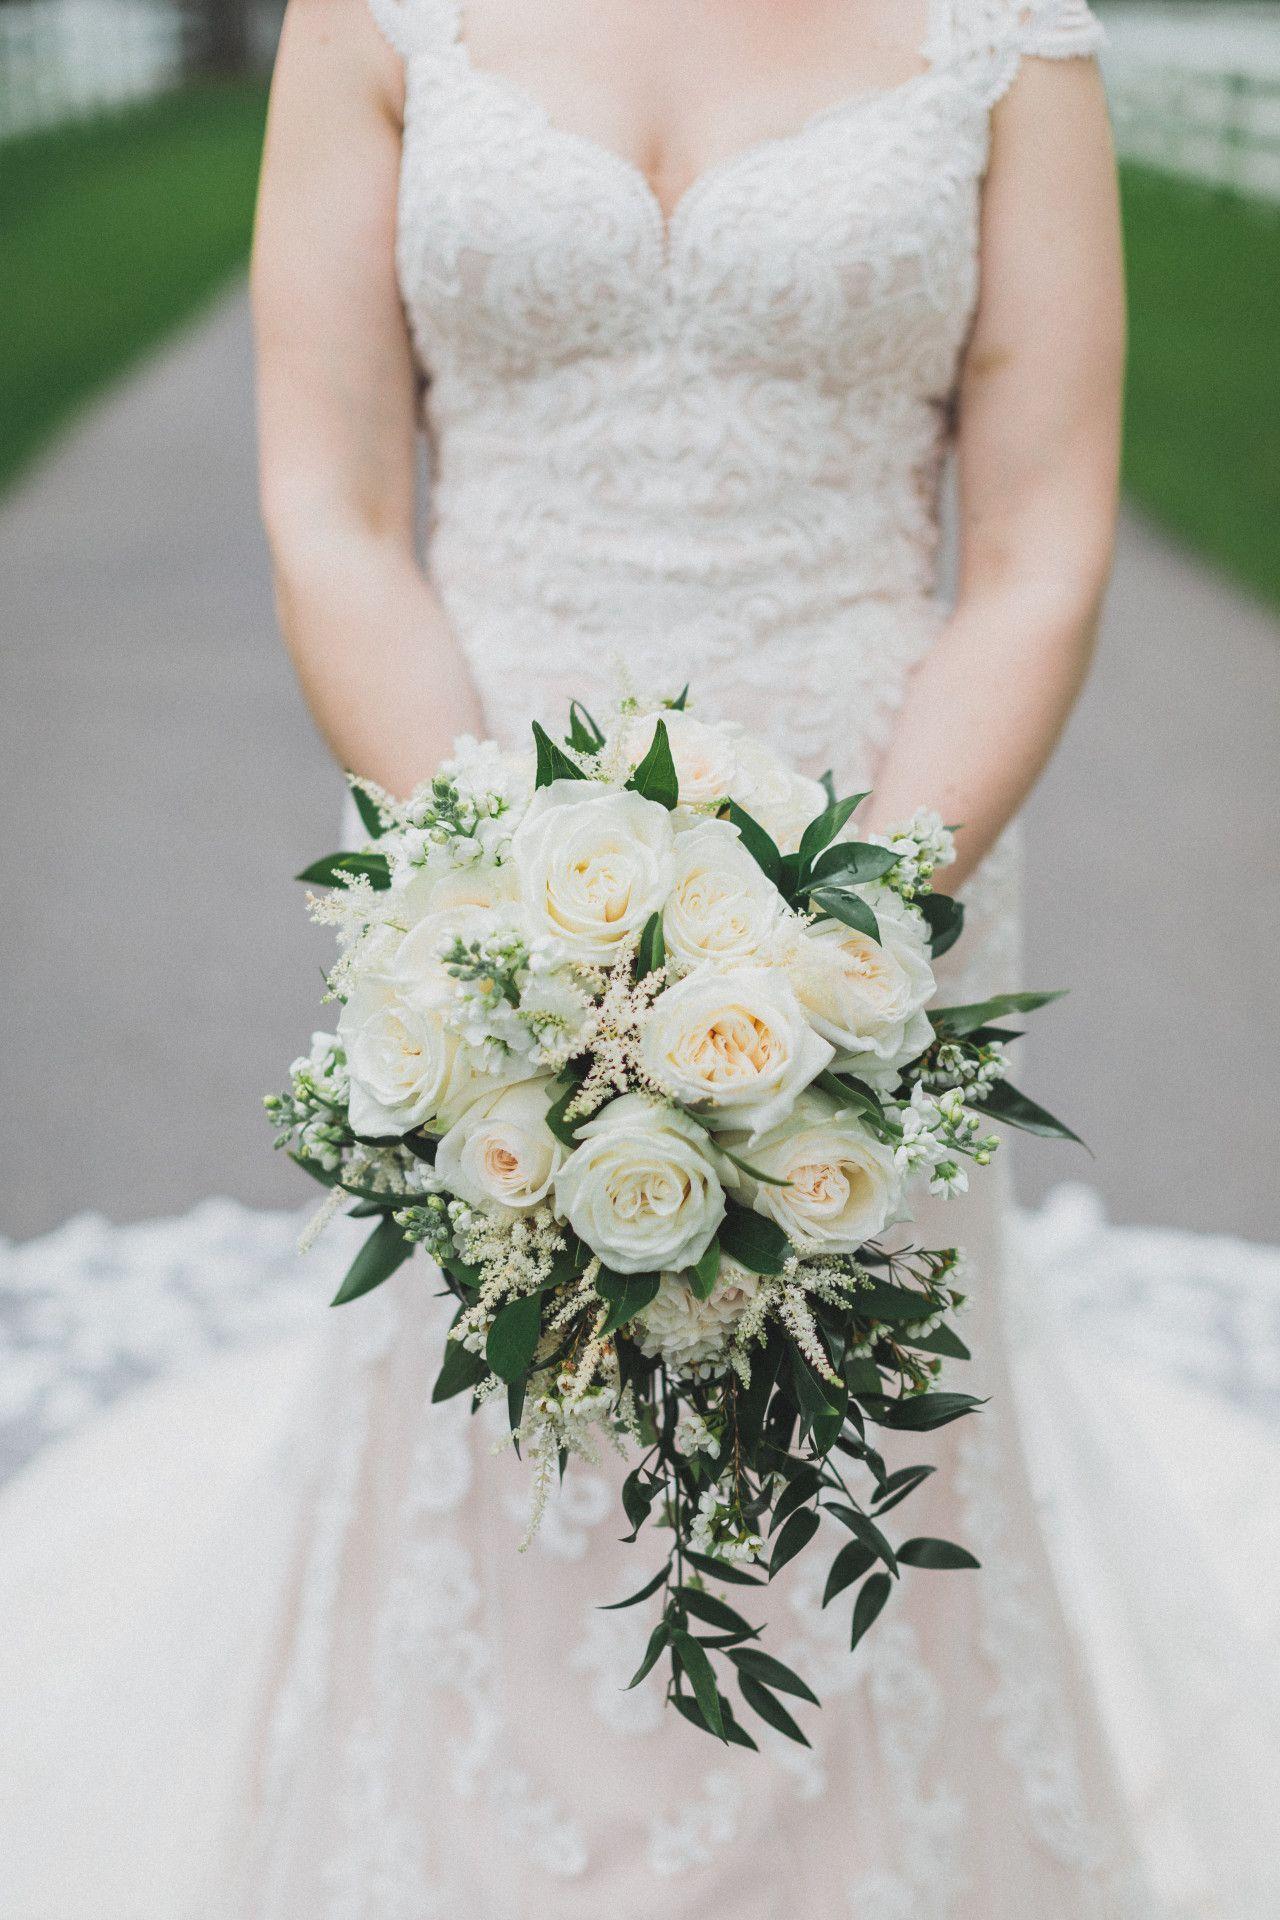 White Rose Bouquet White Wedding Flowers Elegant Hanging Bouquet